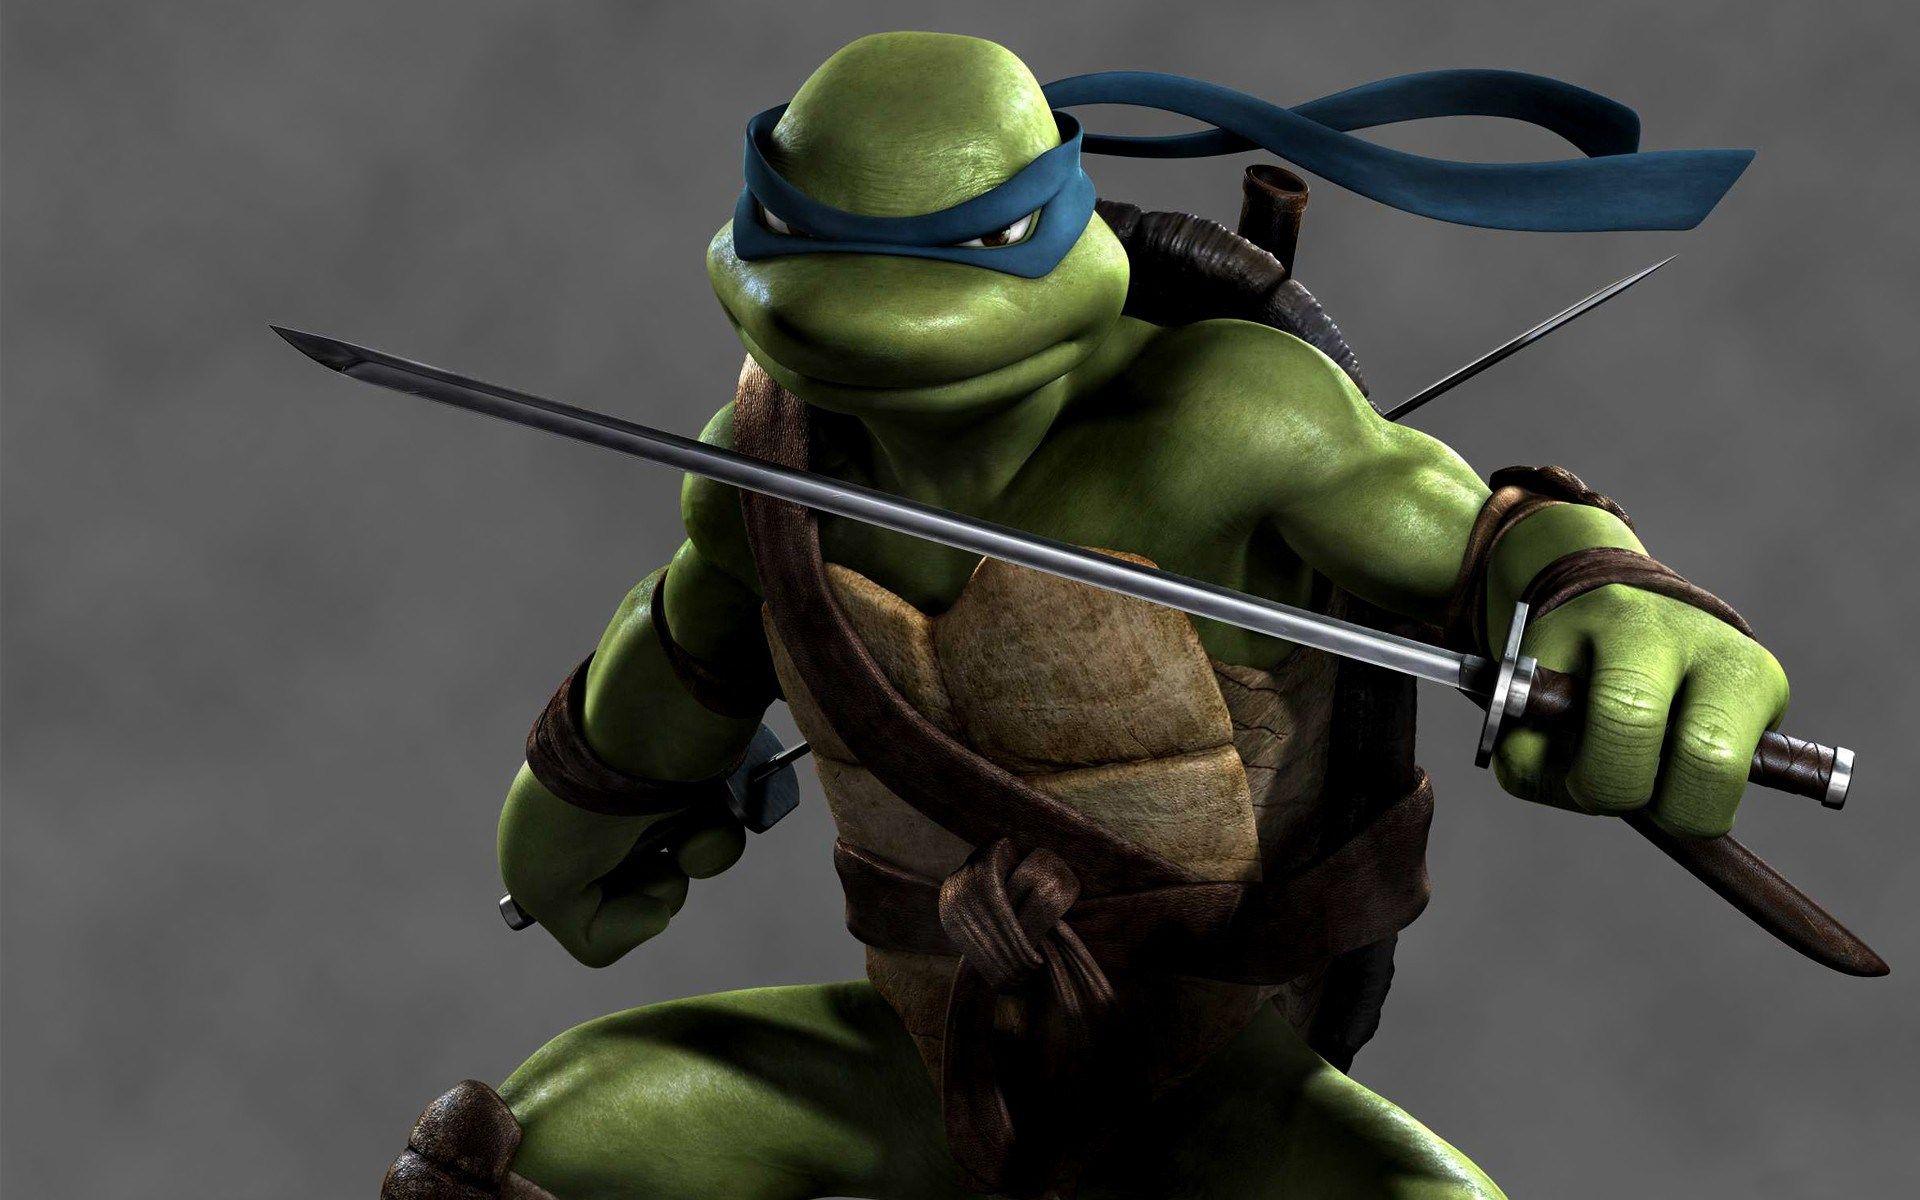 X theme background image - Elford Hardman Ninja Turtles Theme Background Images 1920 X 1200 Px